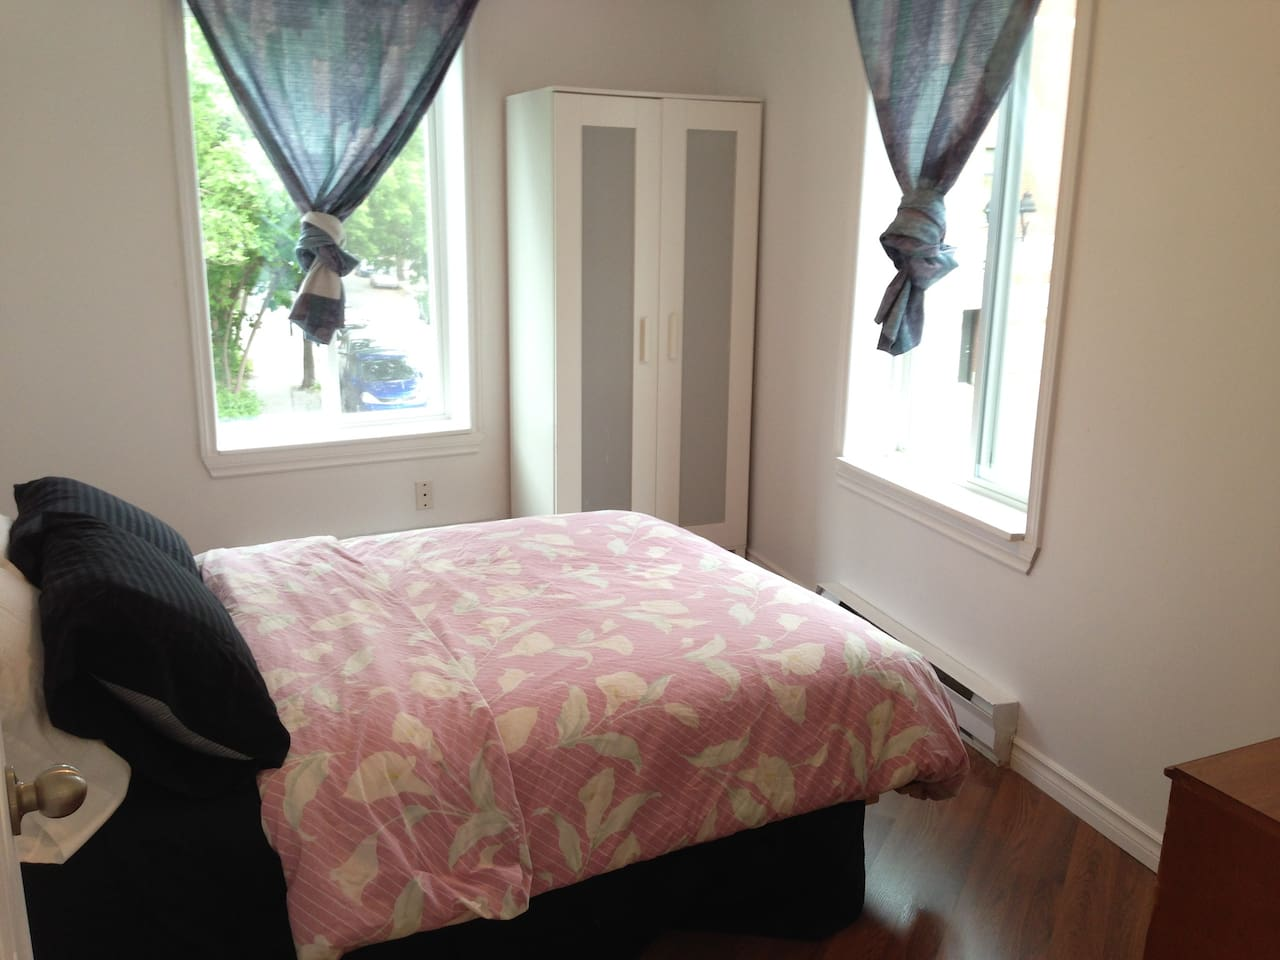 The Magnolia - 2 Beds, 1 Bath